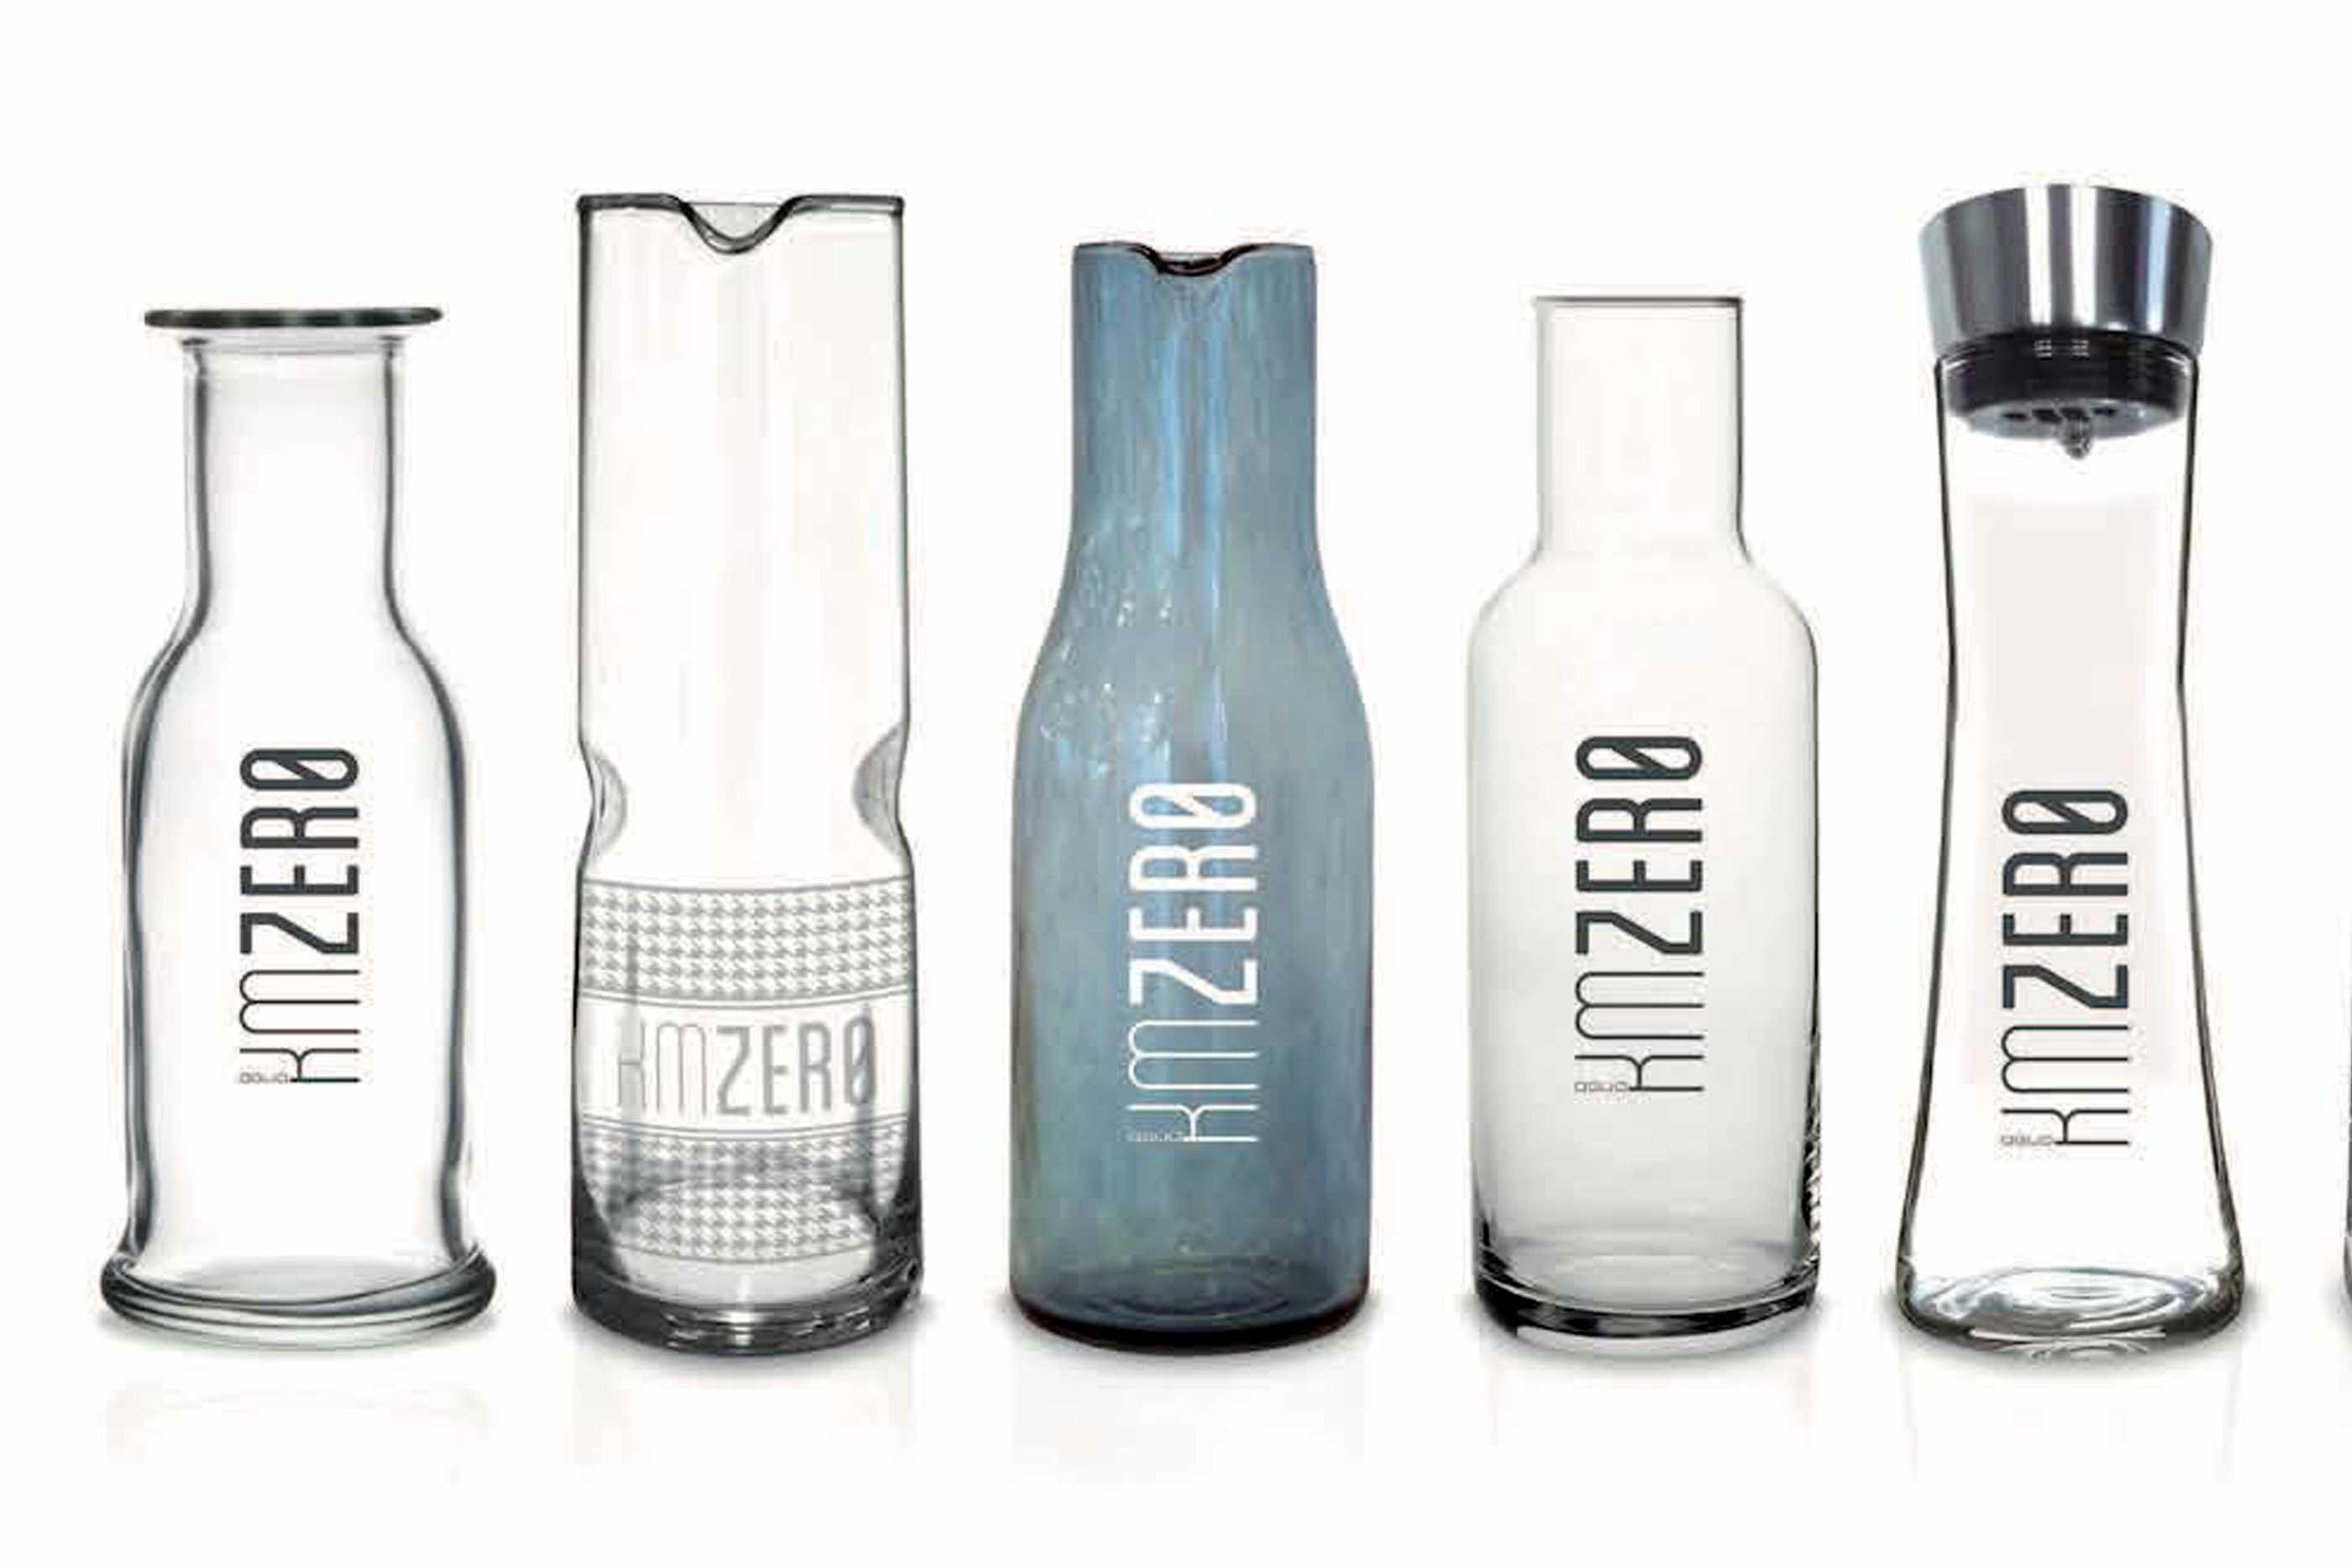 Exemplos de garrafas de água da KMZERO